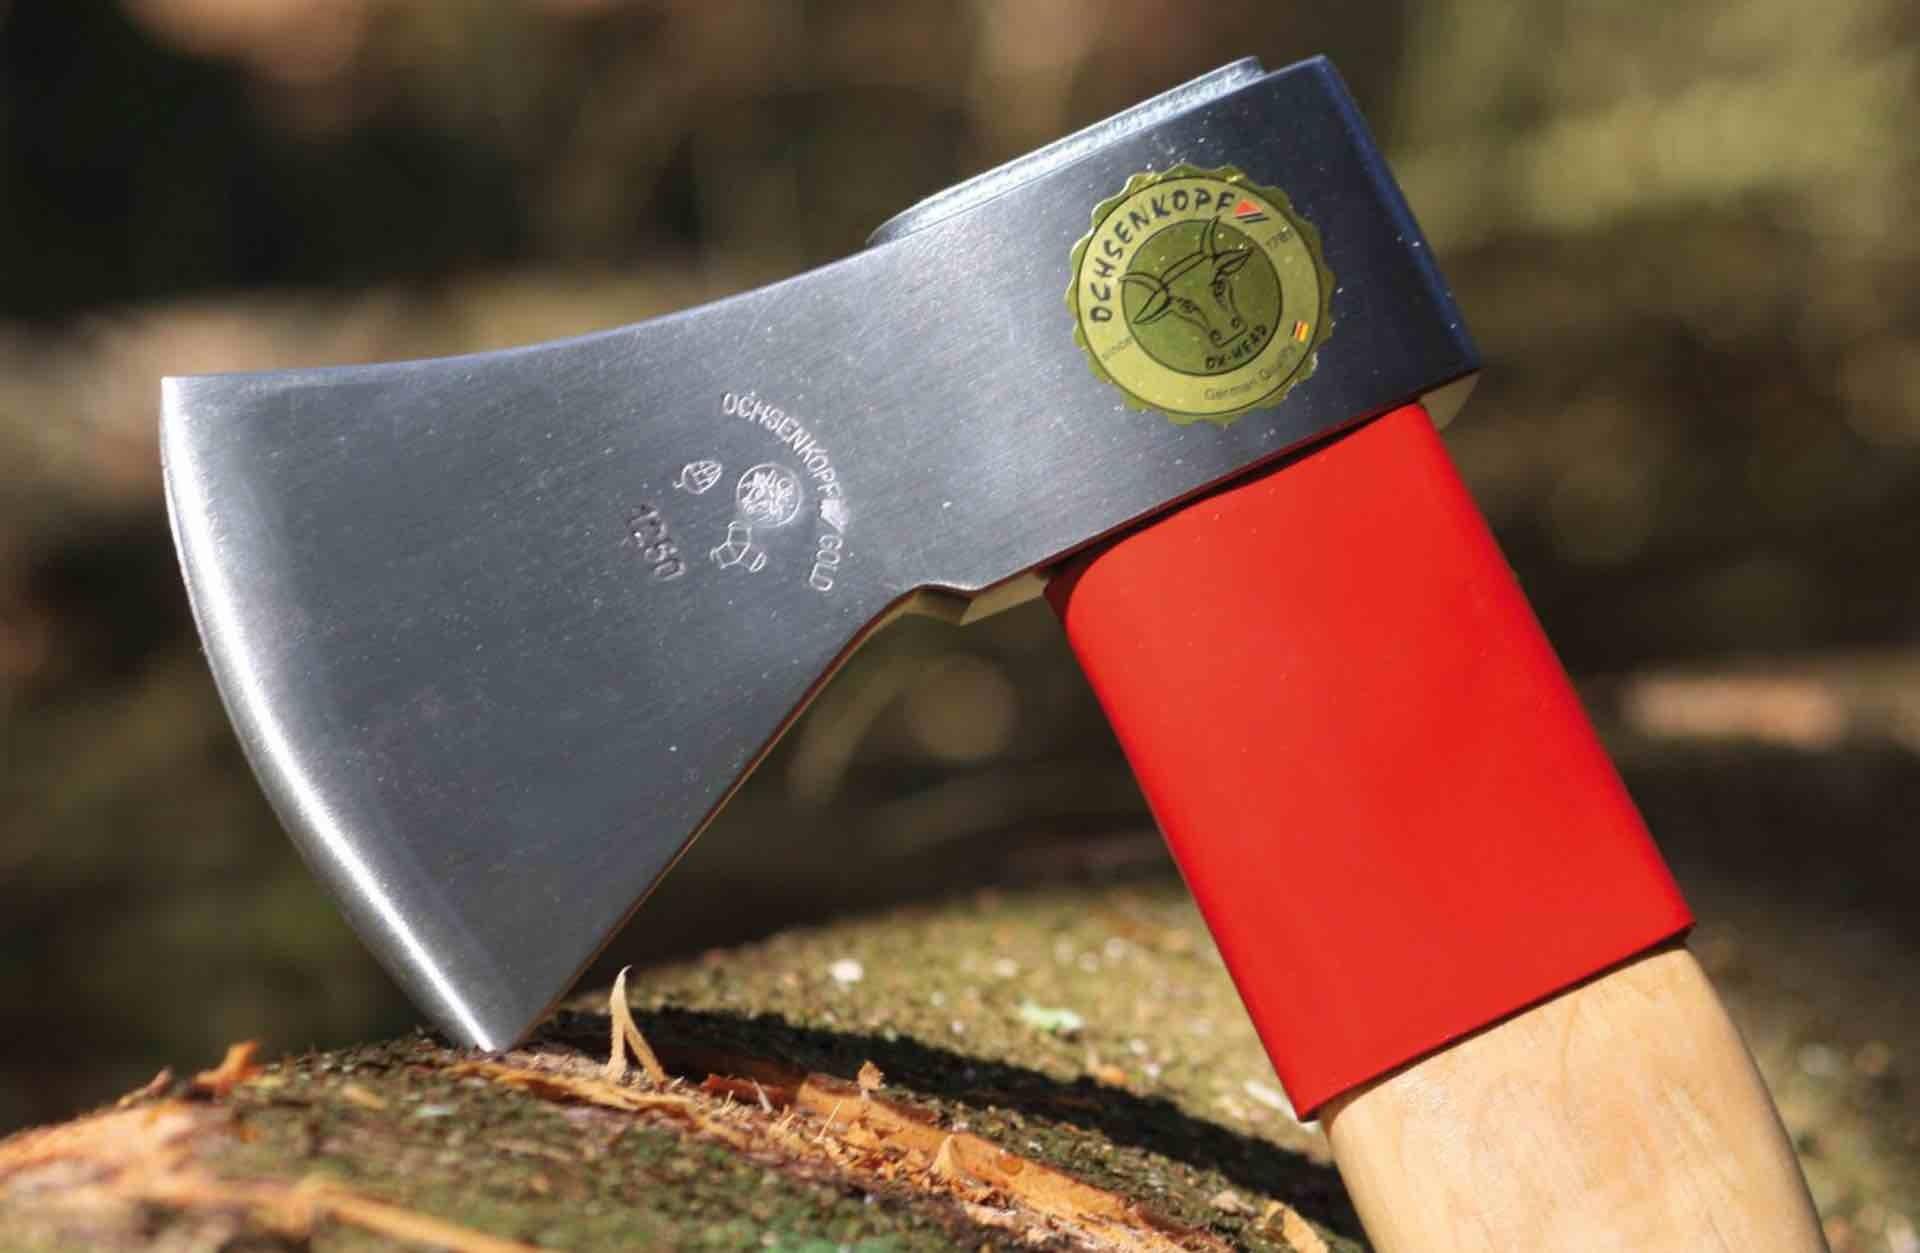 ochsenkopf-universal-forestry-axe-2